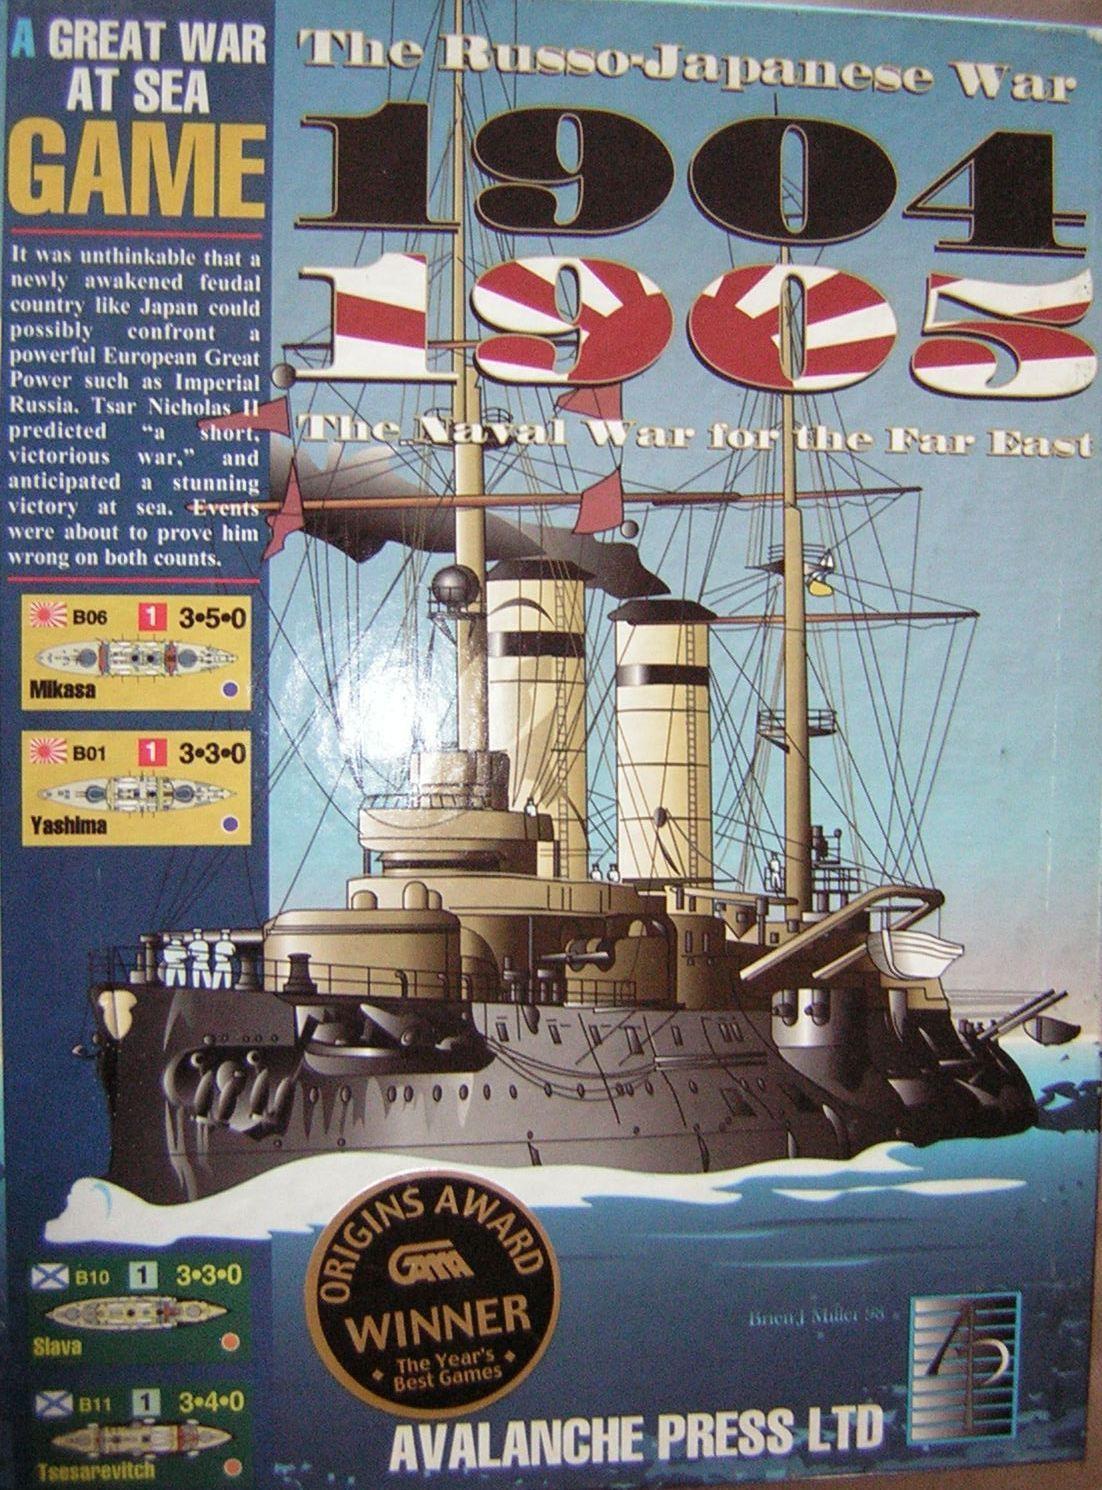 Great War at Sea 19041905, The RussoJapanese War War